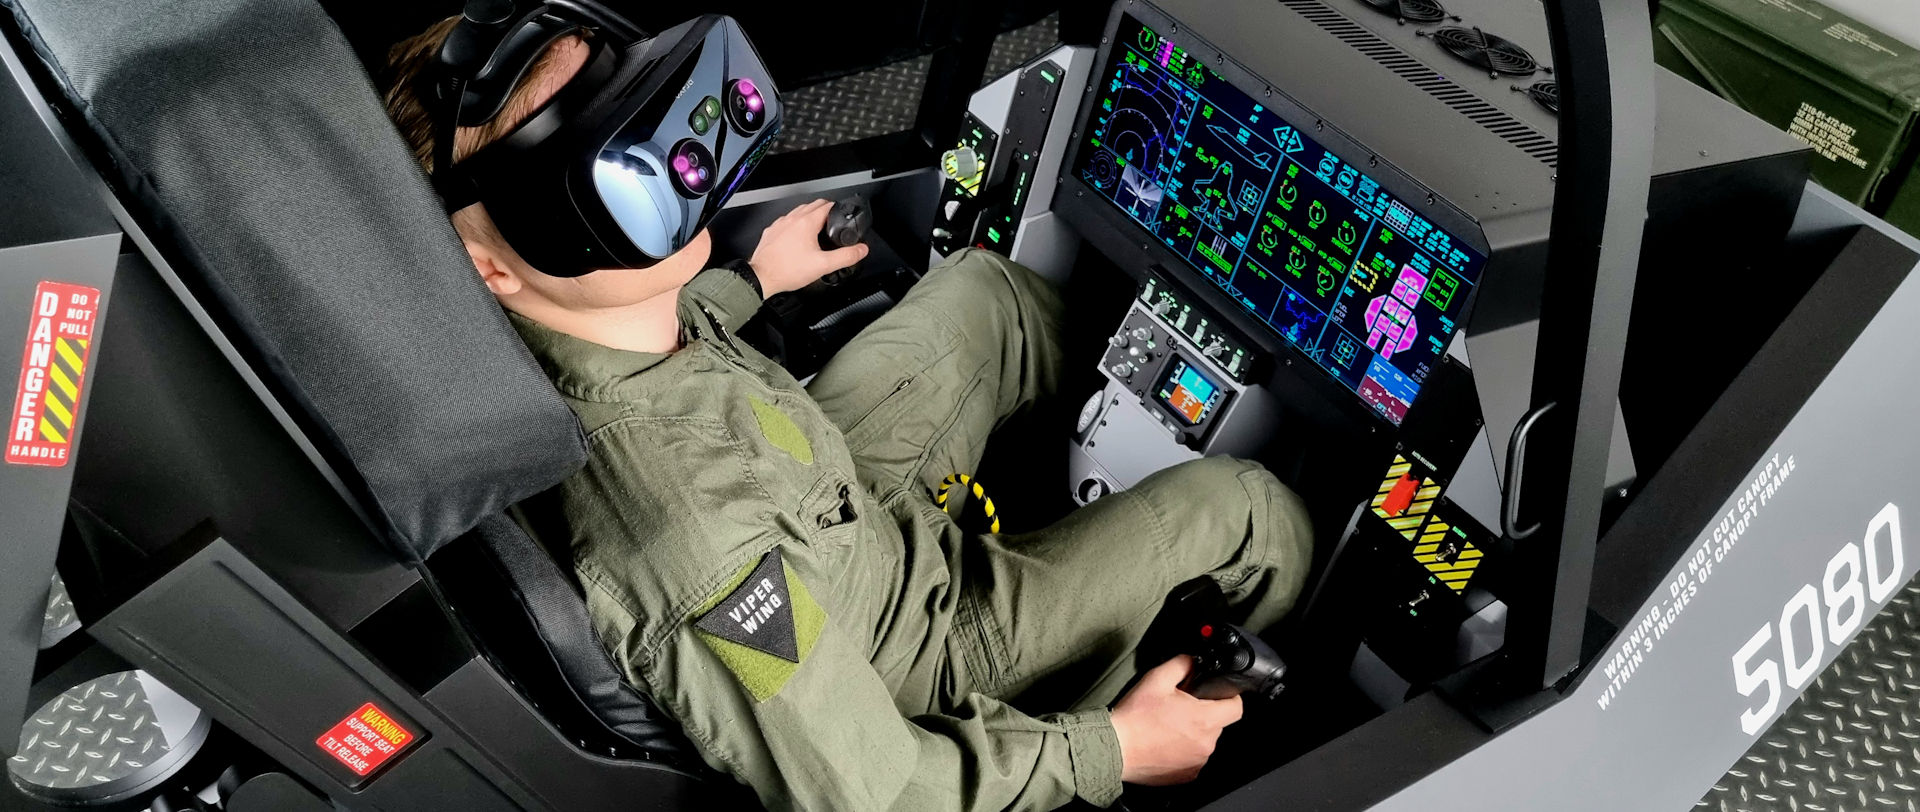 Ready, PREPAR3D based, F-35 Fighter Jet Simulator